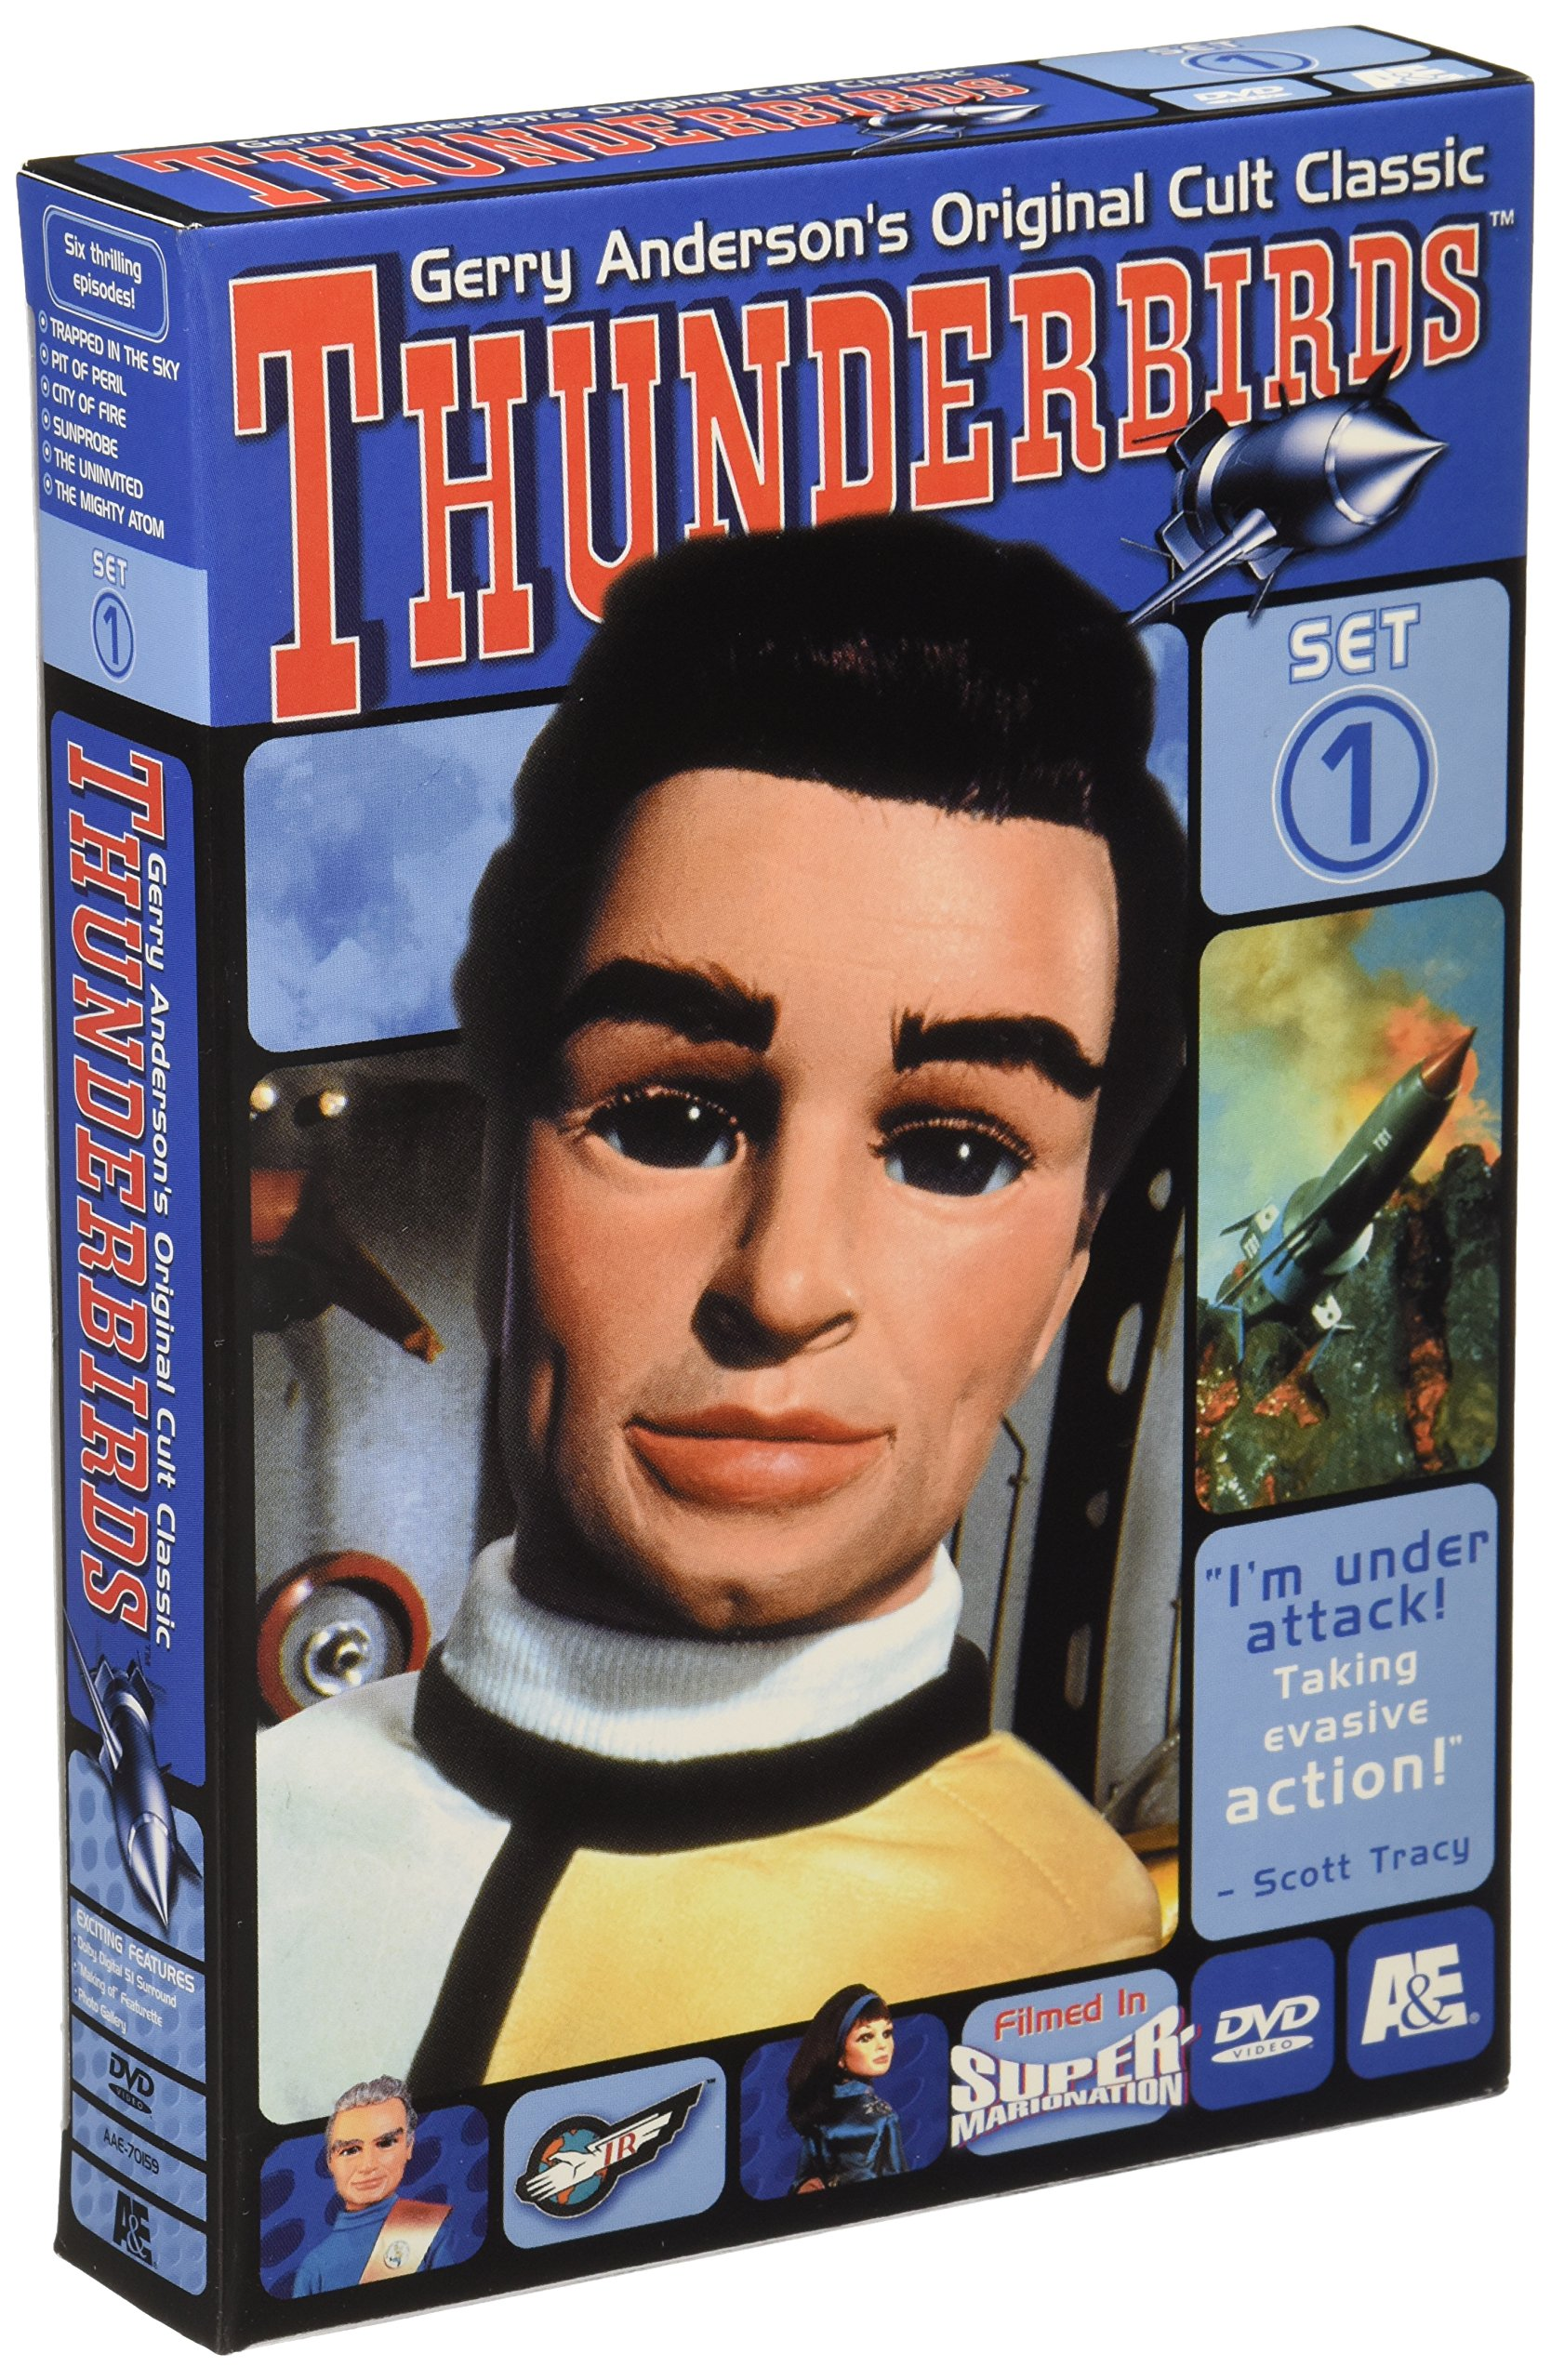 Thunderbirds - Set 1 by A&E